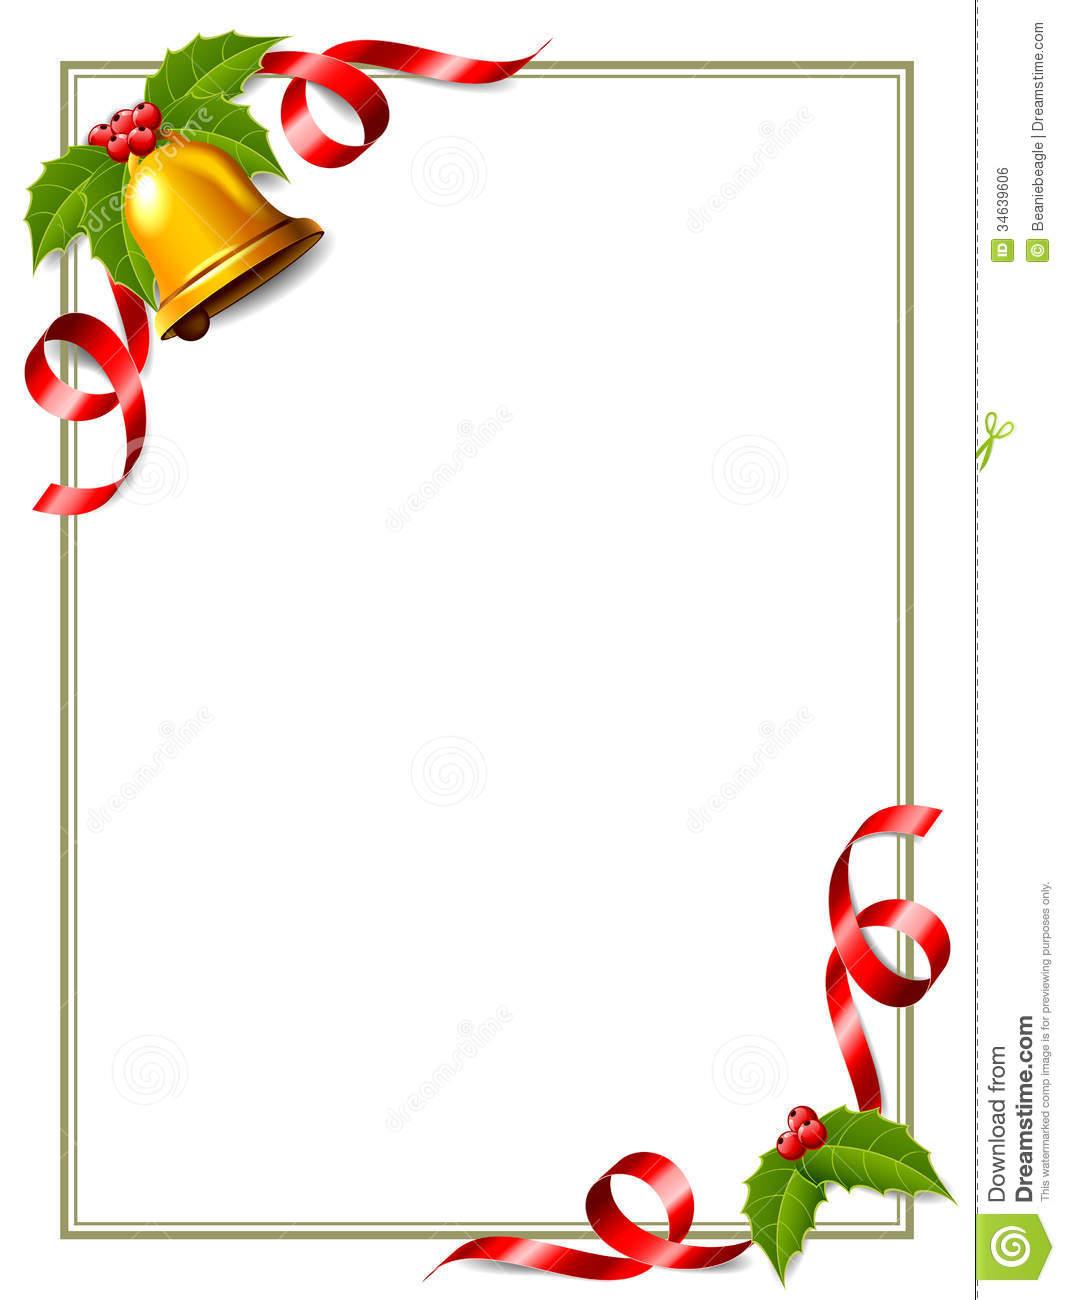 Clipart Christmas Bells Border.